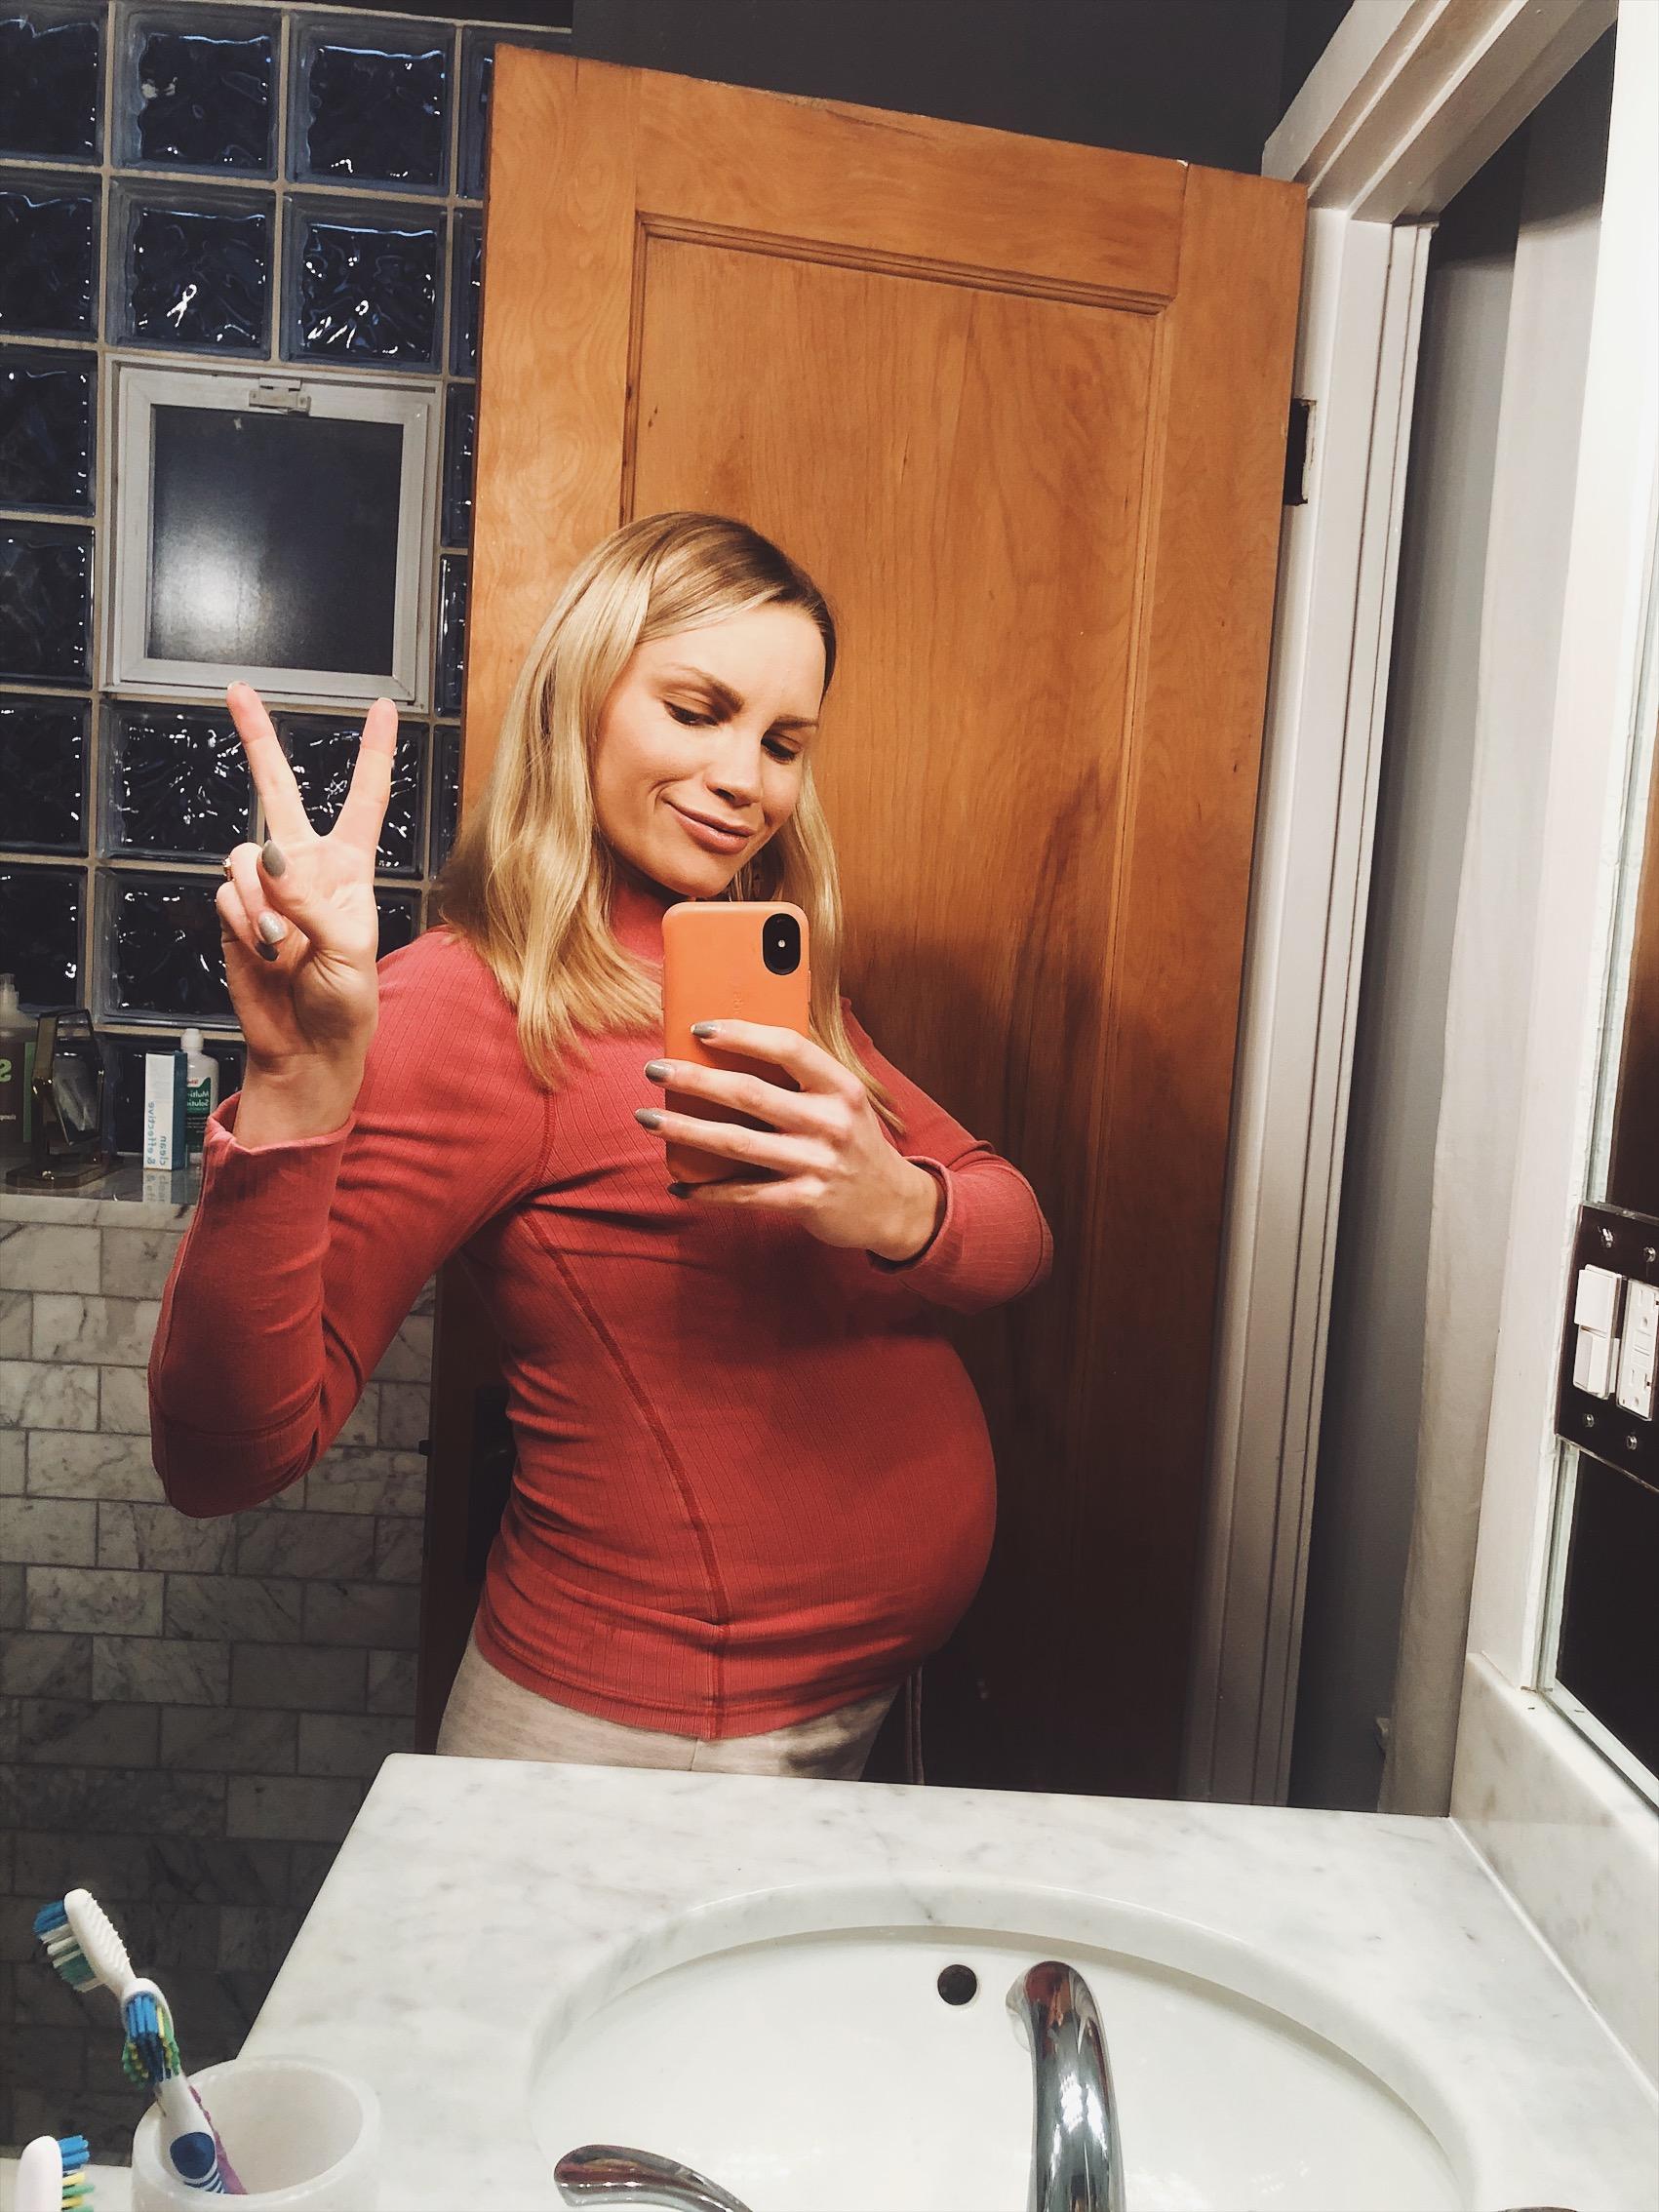 monique taking a bathroom mirror selfie